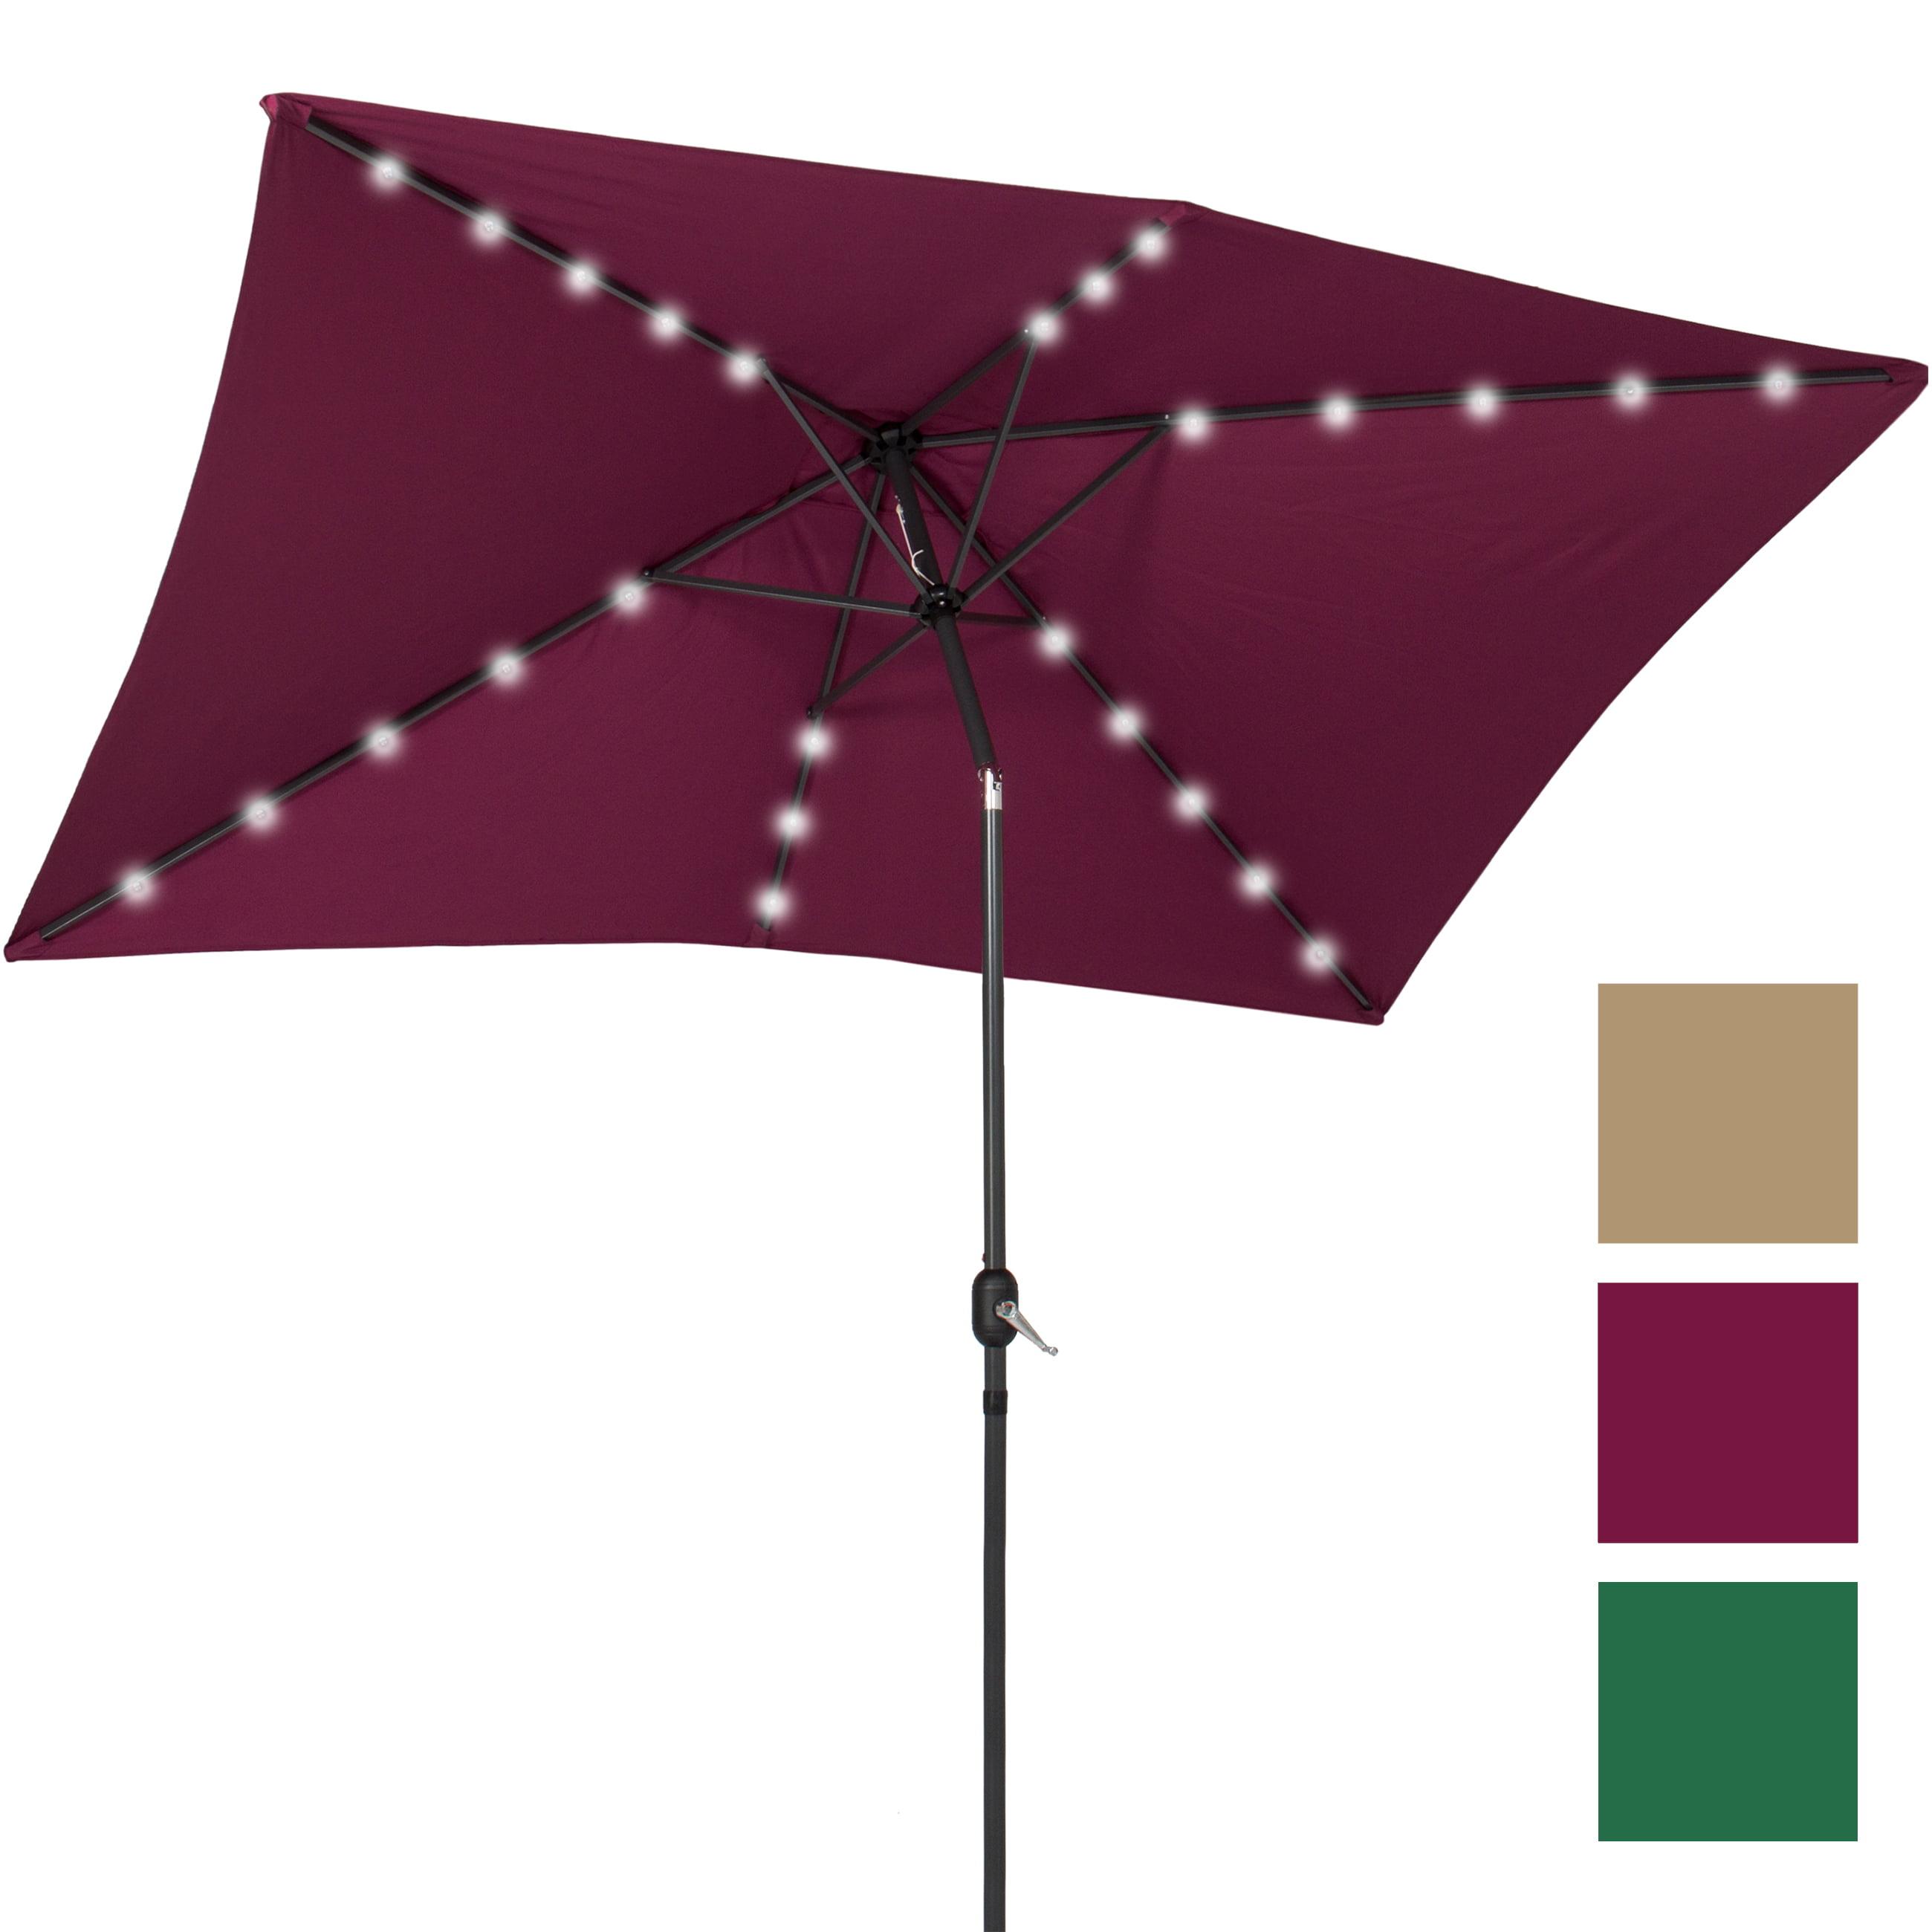 BCP 10' x 6.5' LED Solar Patio Umbrella With Tilt Adjustment Multicolor by Patio Umbrellas